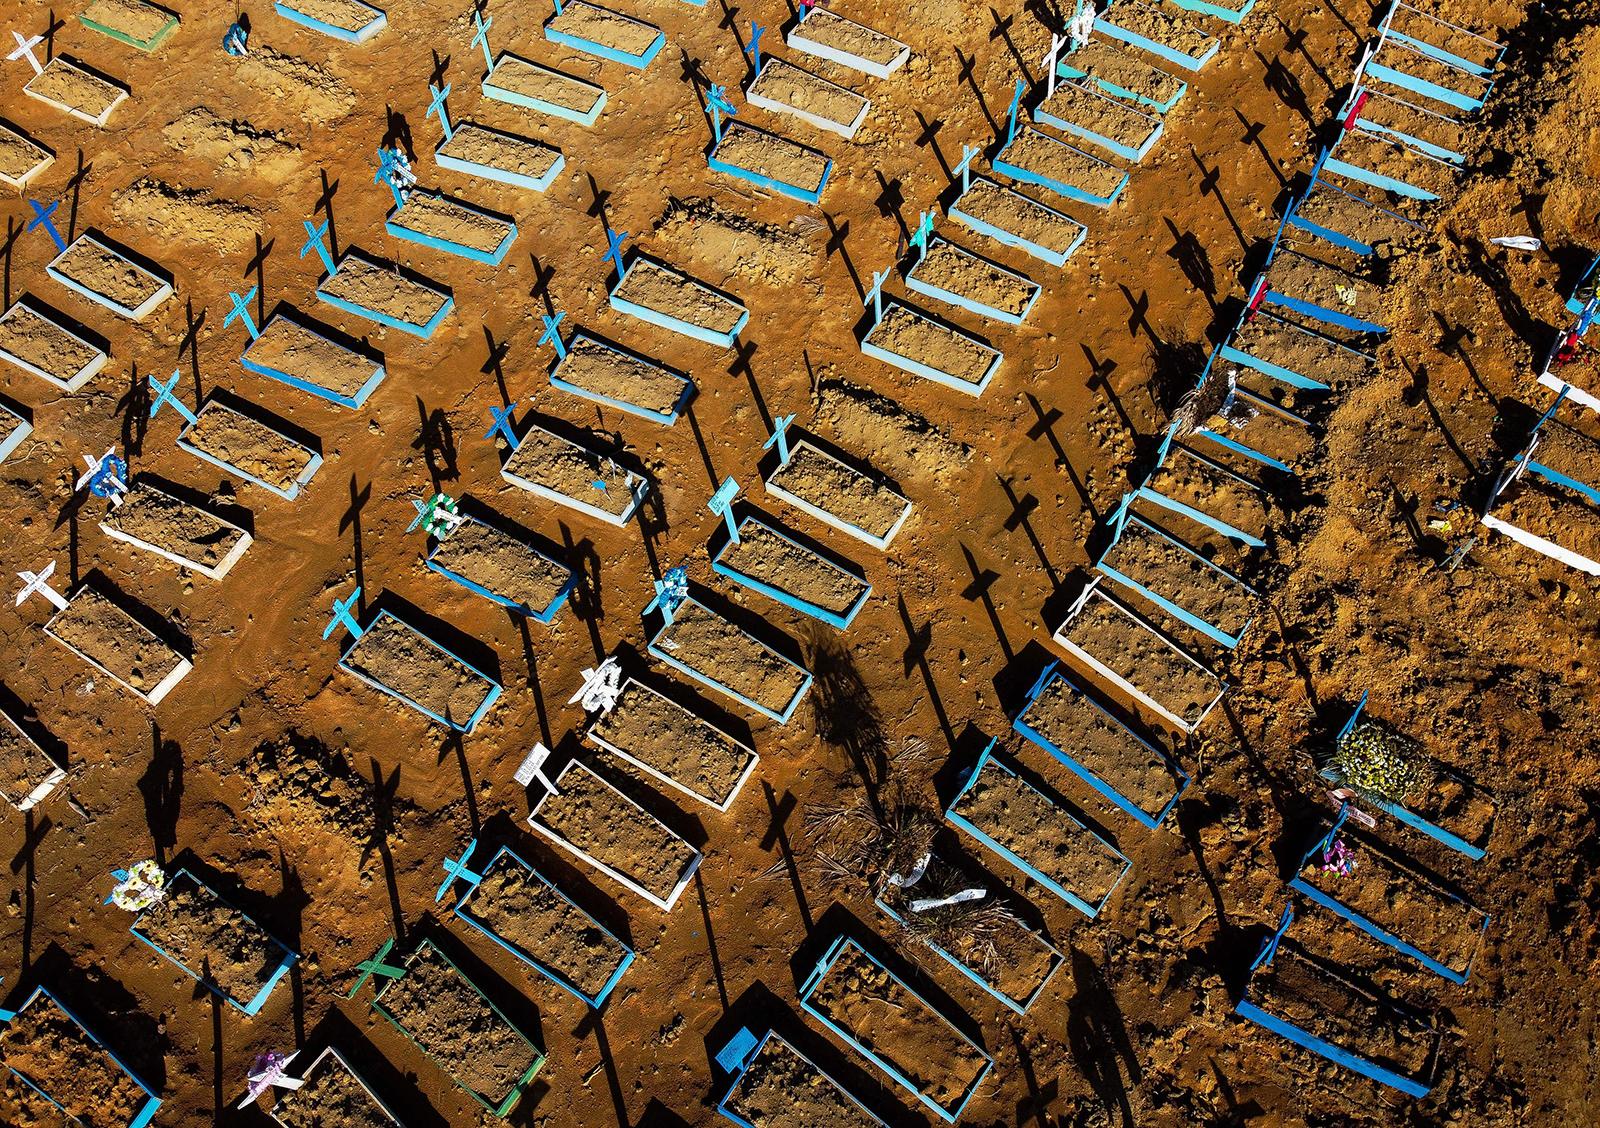 Aerial view showing graves in the Nossa Senhora Aparecida cemetery in Manaus, Brazil on June 21.